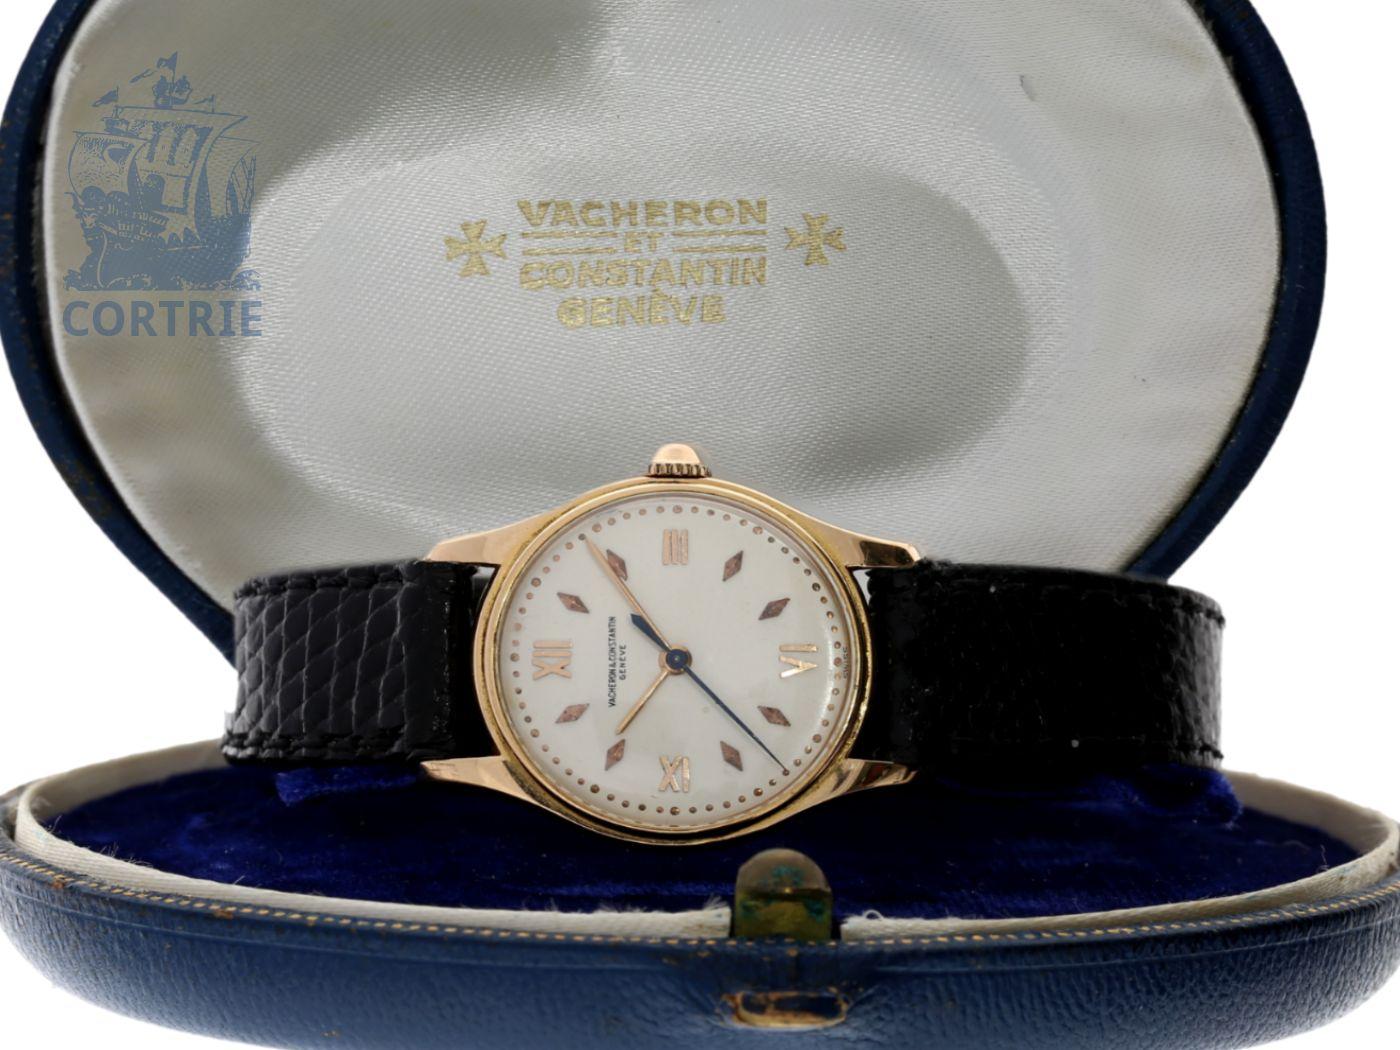 Wristwatch: very fine and rare vintage ladies watch, pink gold, center seconds, original box, Vacheron & Constantin Geneve 1950-